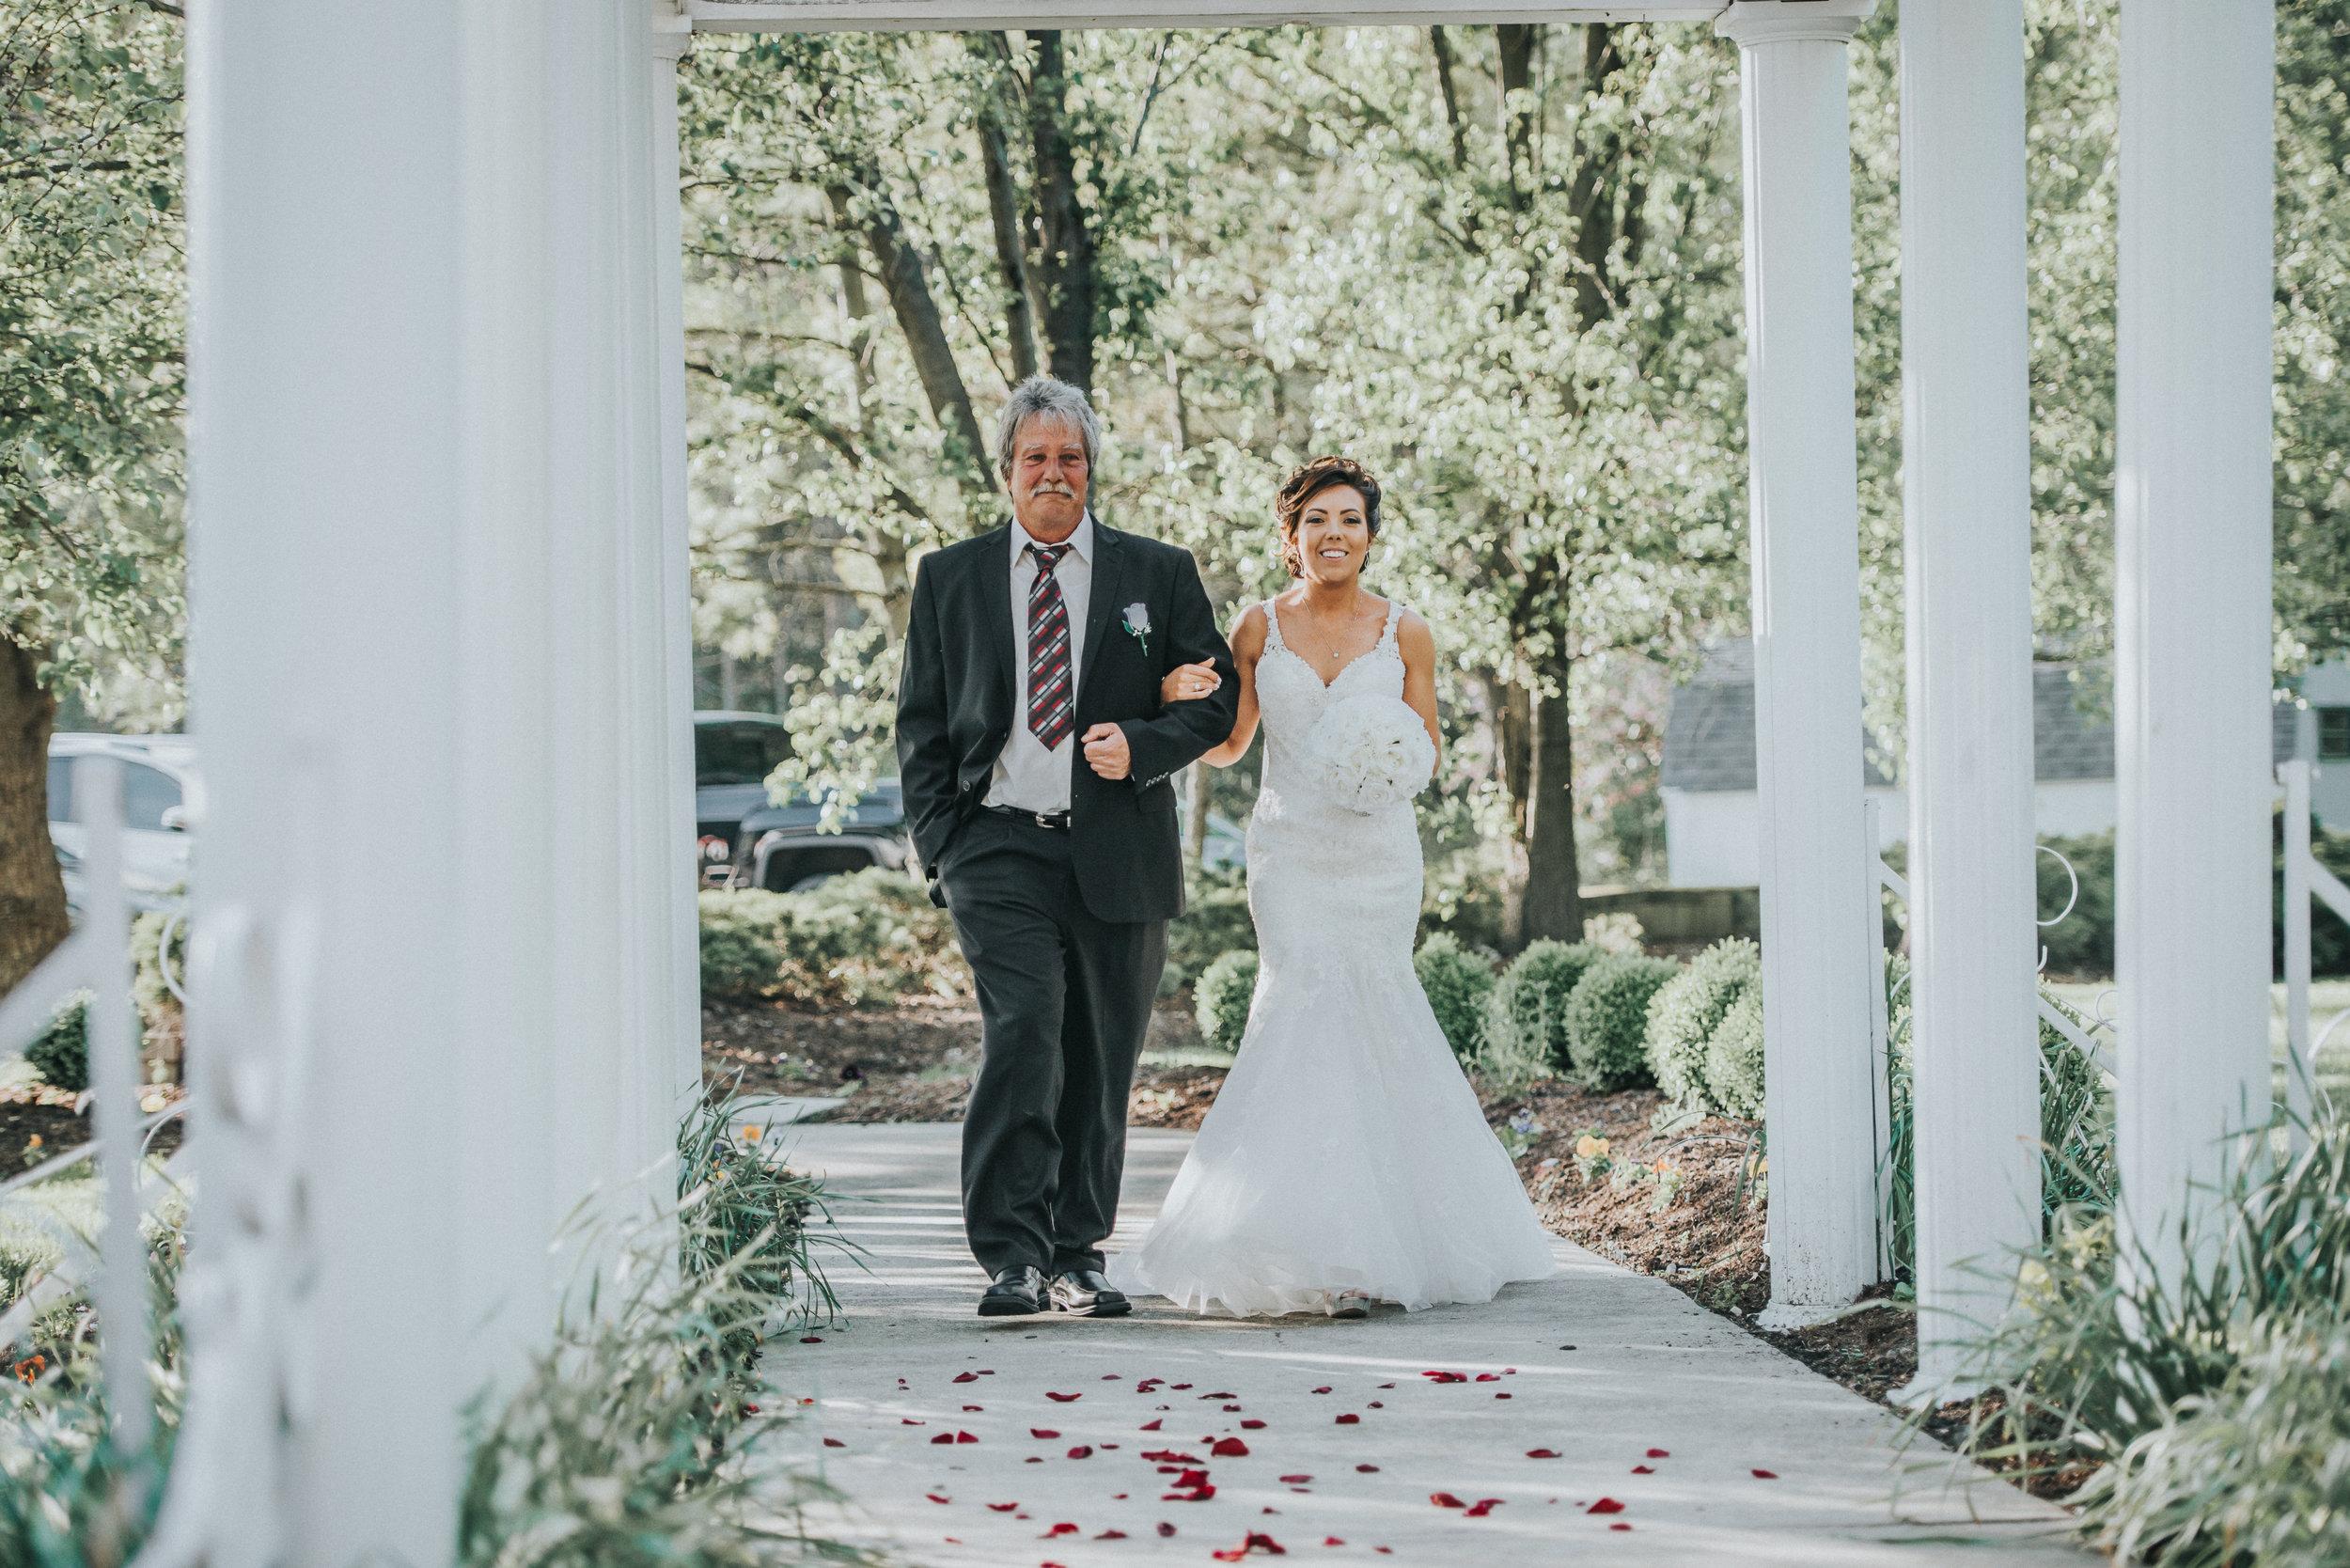 Christina-and-Gene-Wedding-Marla-Rain-Photography-317.jpg